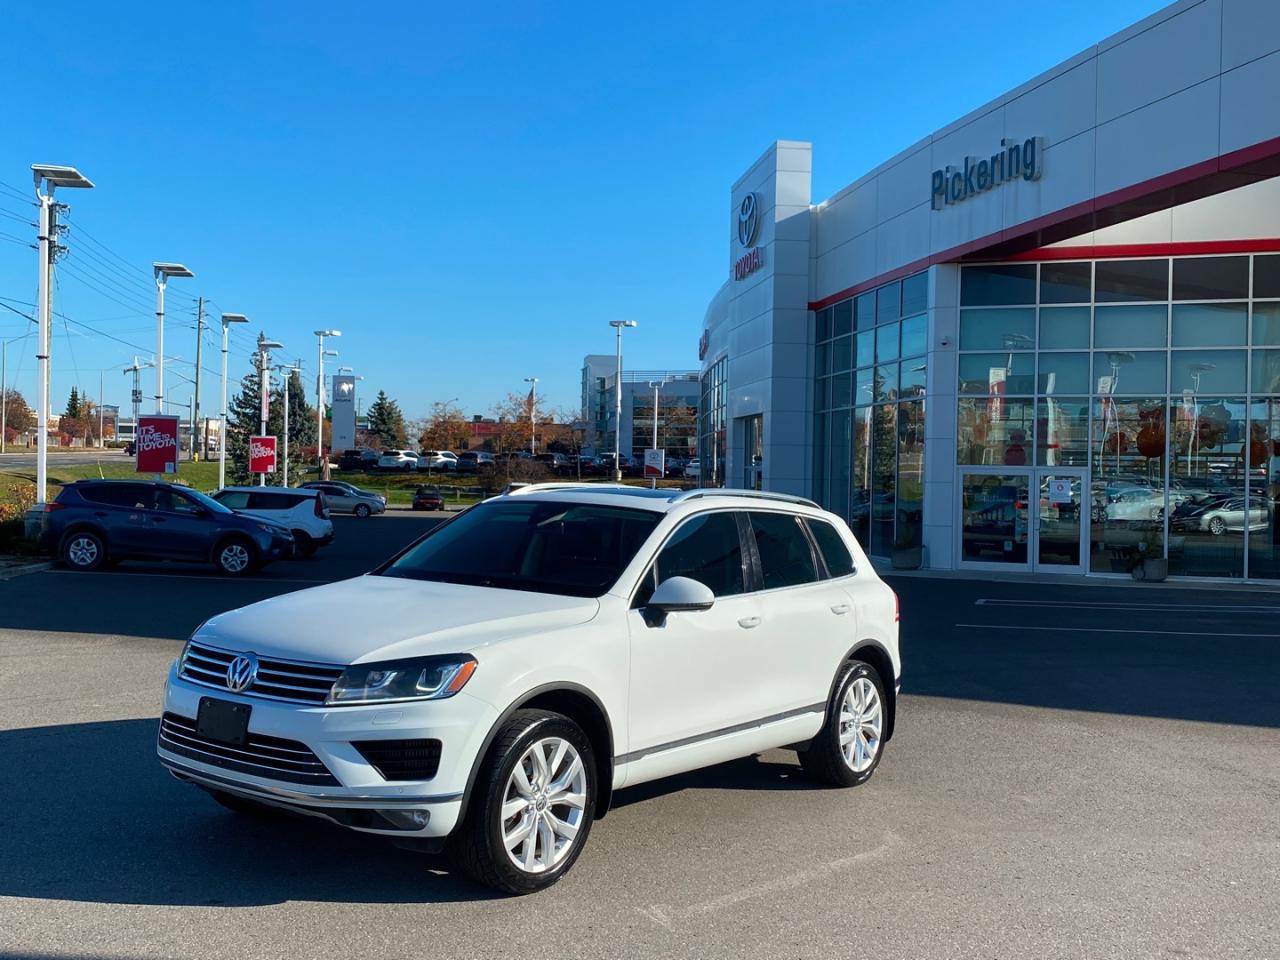 Used Volkswagen Touareg On Sale Pickering Toyota